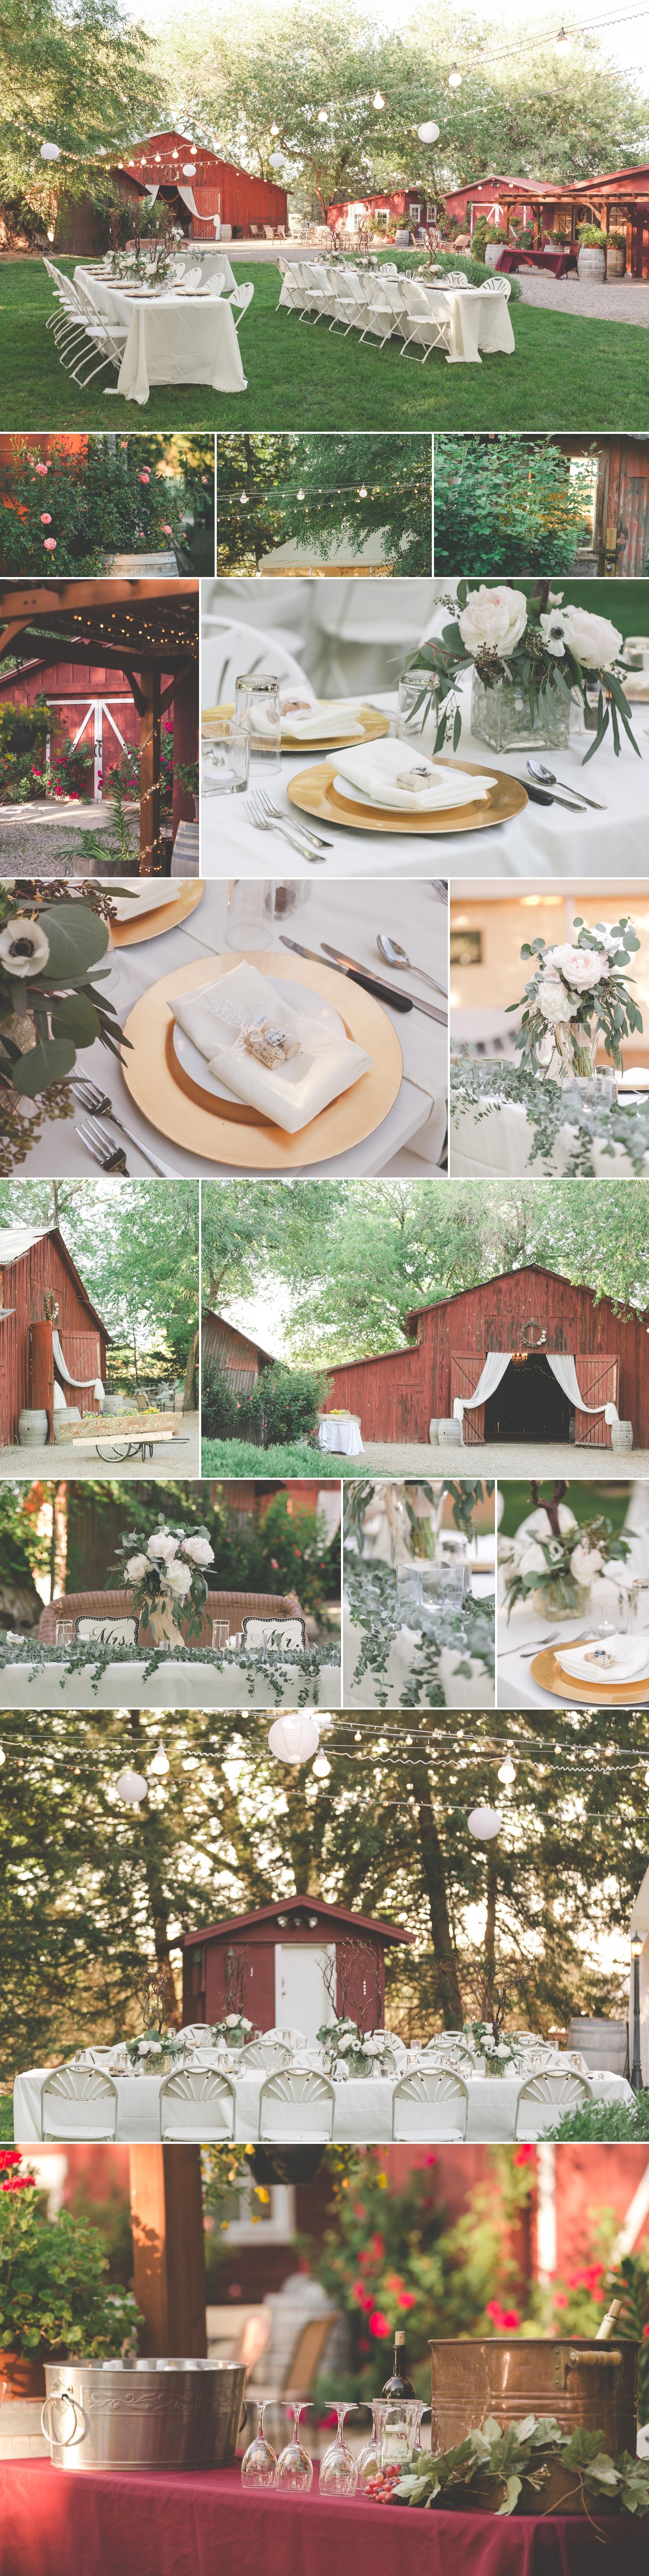 emery inman wedding 4.jpg